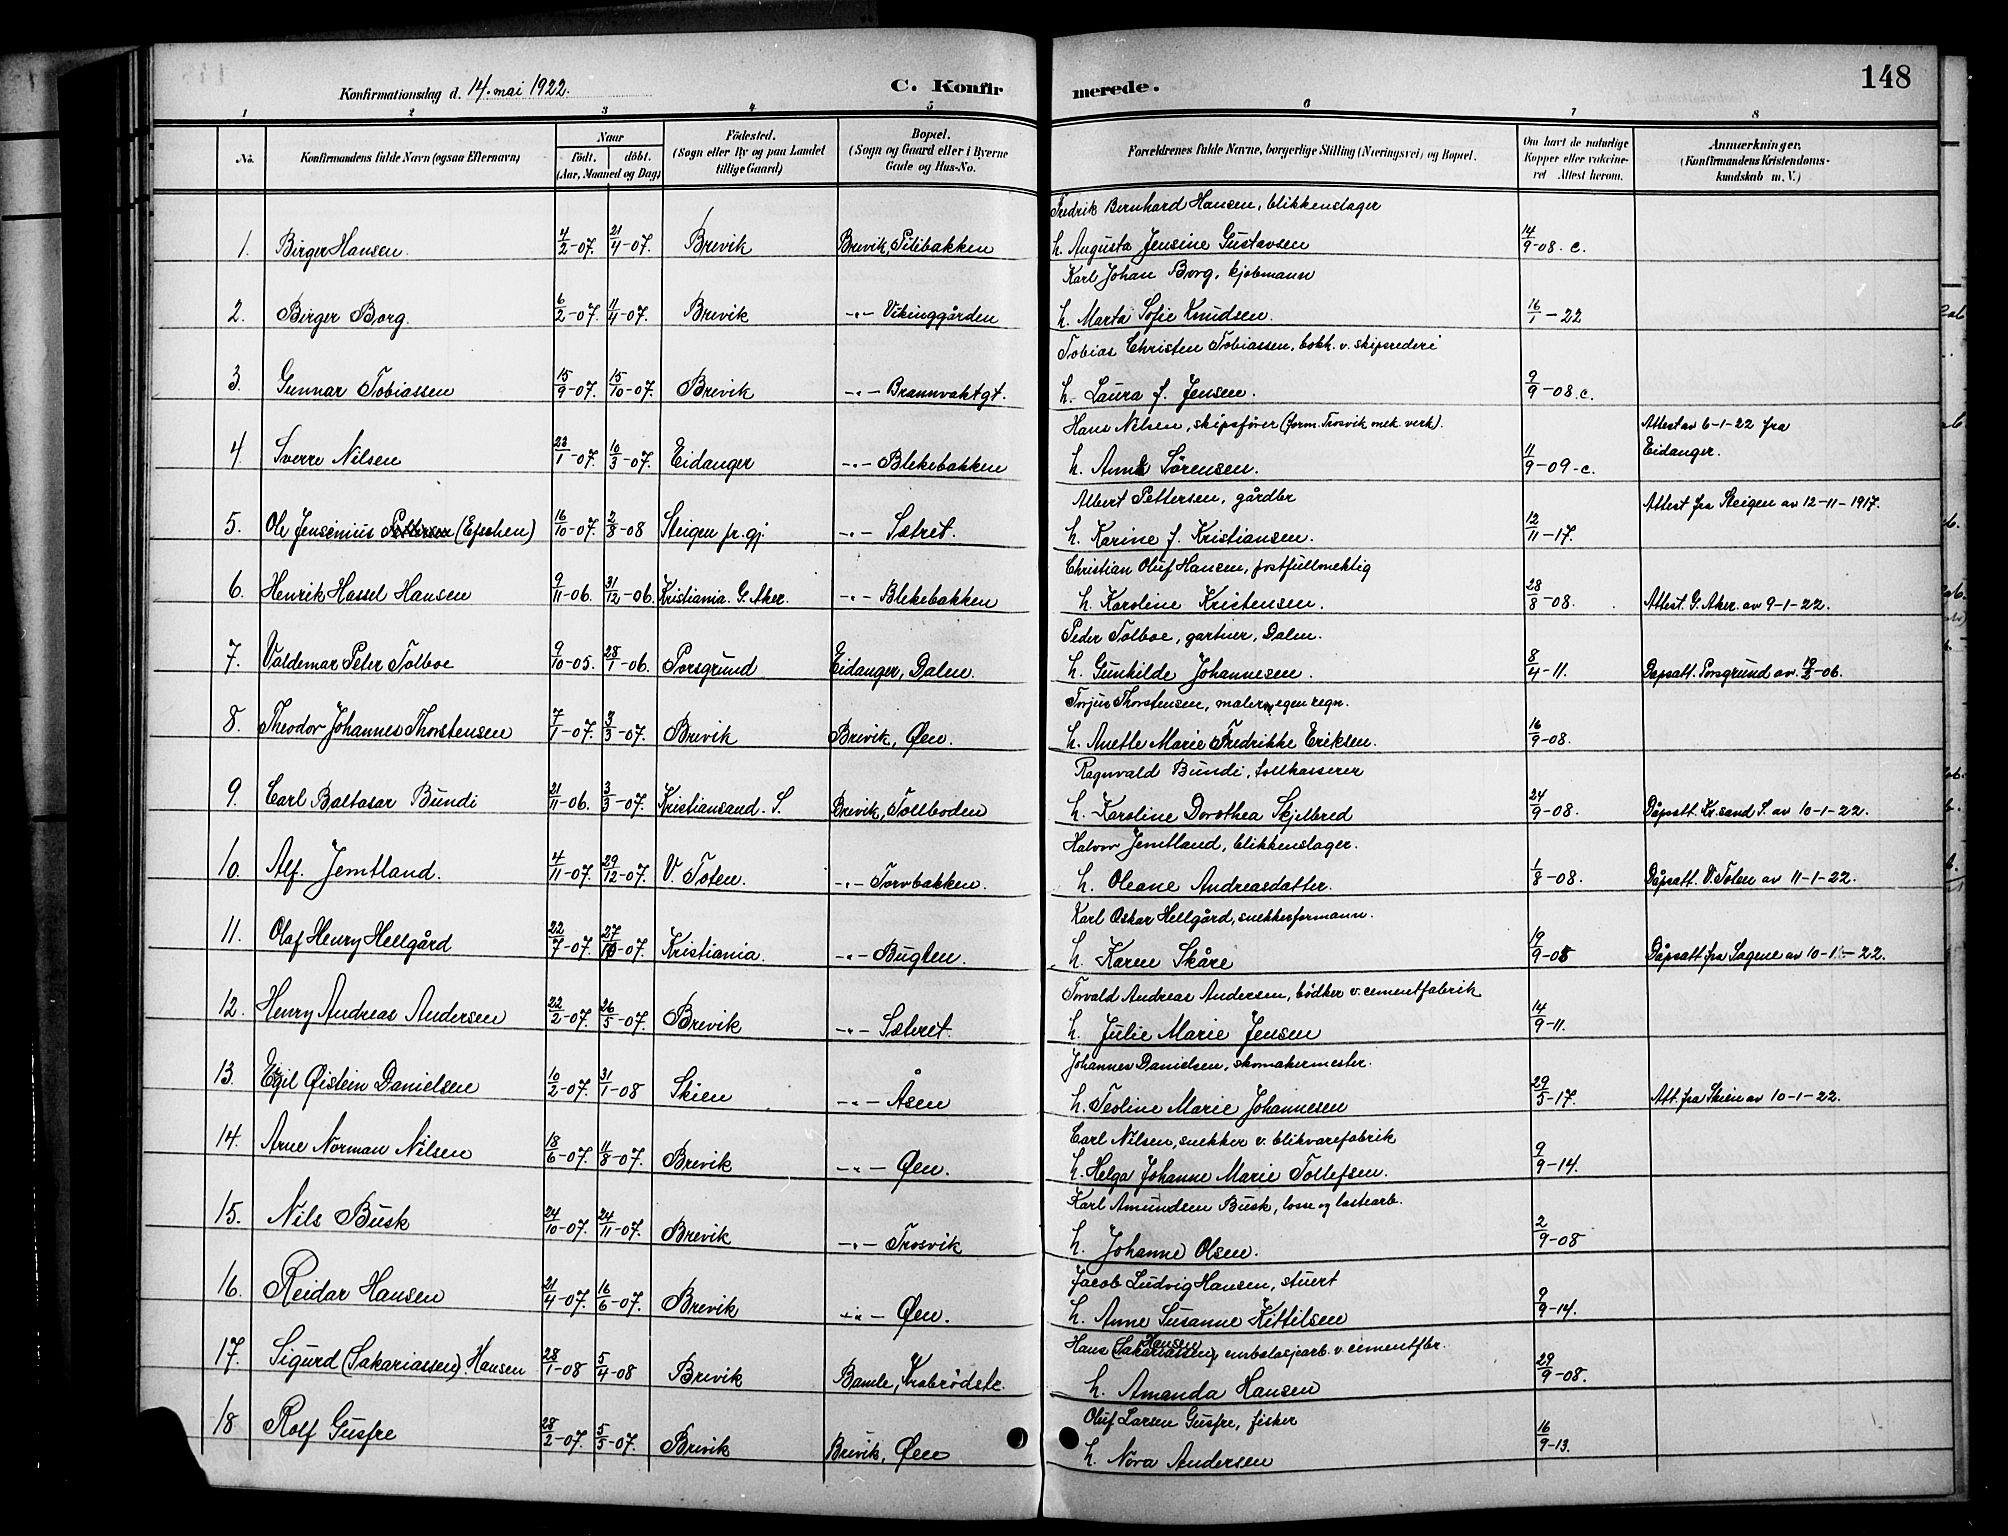 SAKO, Brevik kirkebøker, G/Ga/L0005: Klokkerbok nr. 5, 1901-1924, s. 148